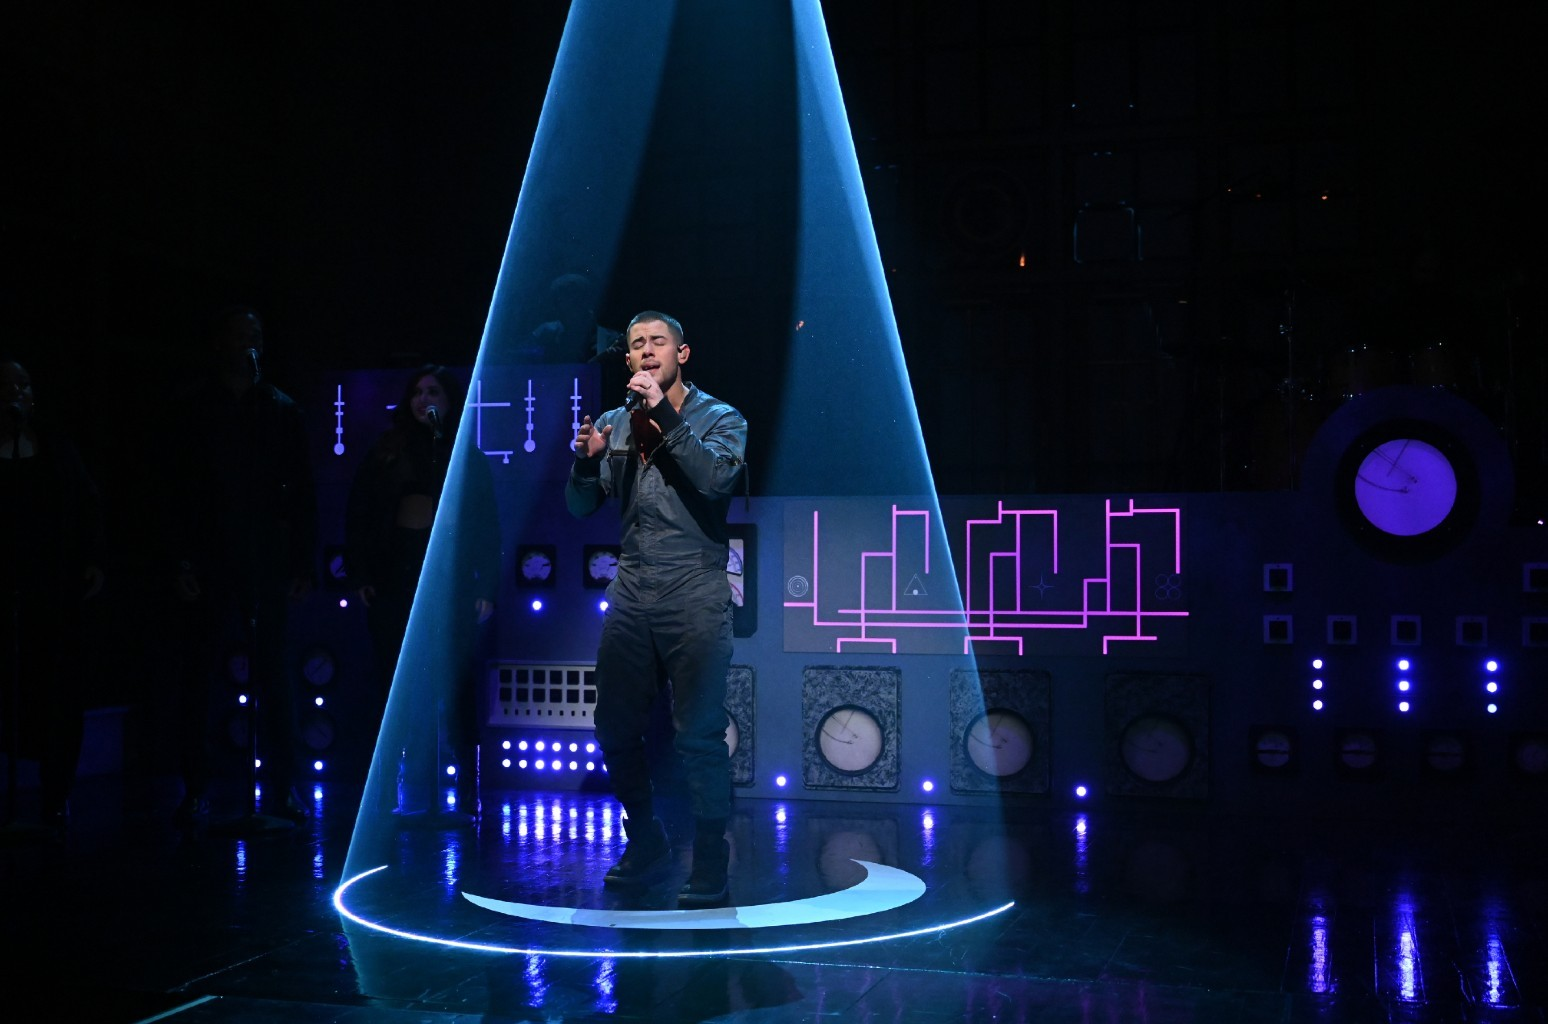 Ник Джонас представил премьеру новых песен «Spaceman» и «This Is Heaven» на канале SNL: смотрите